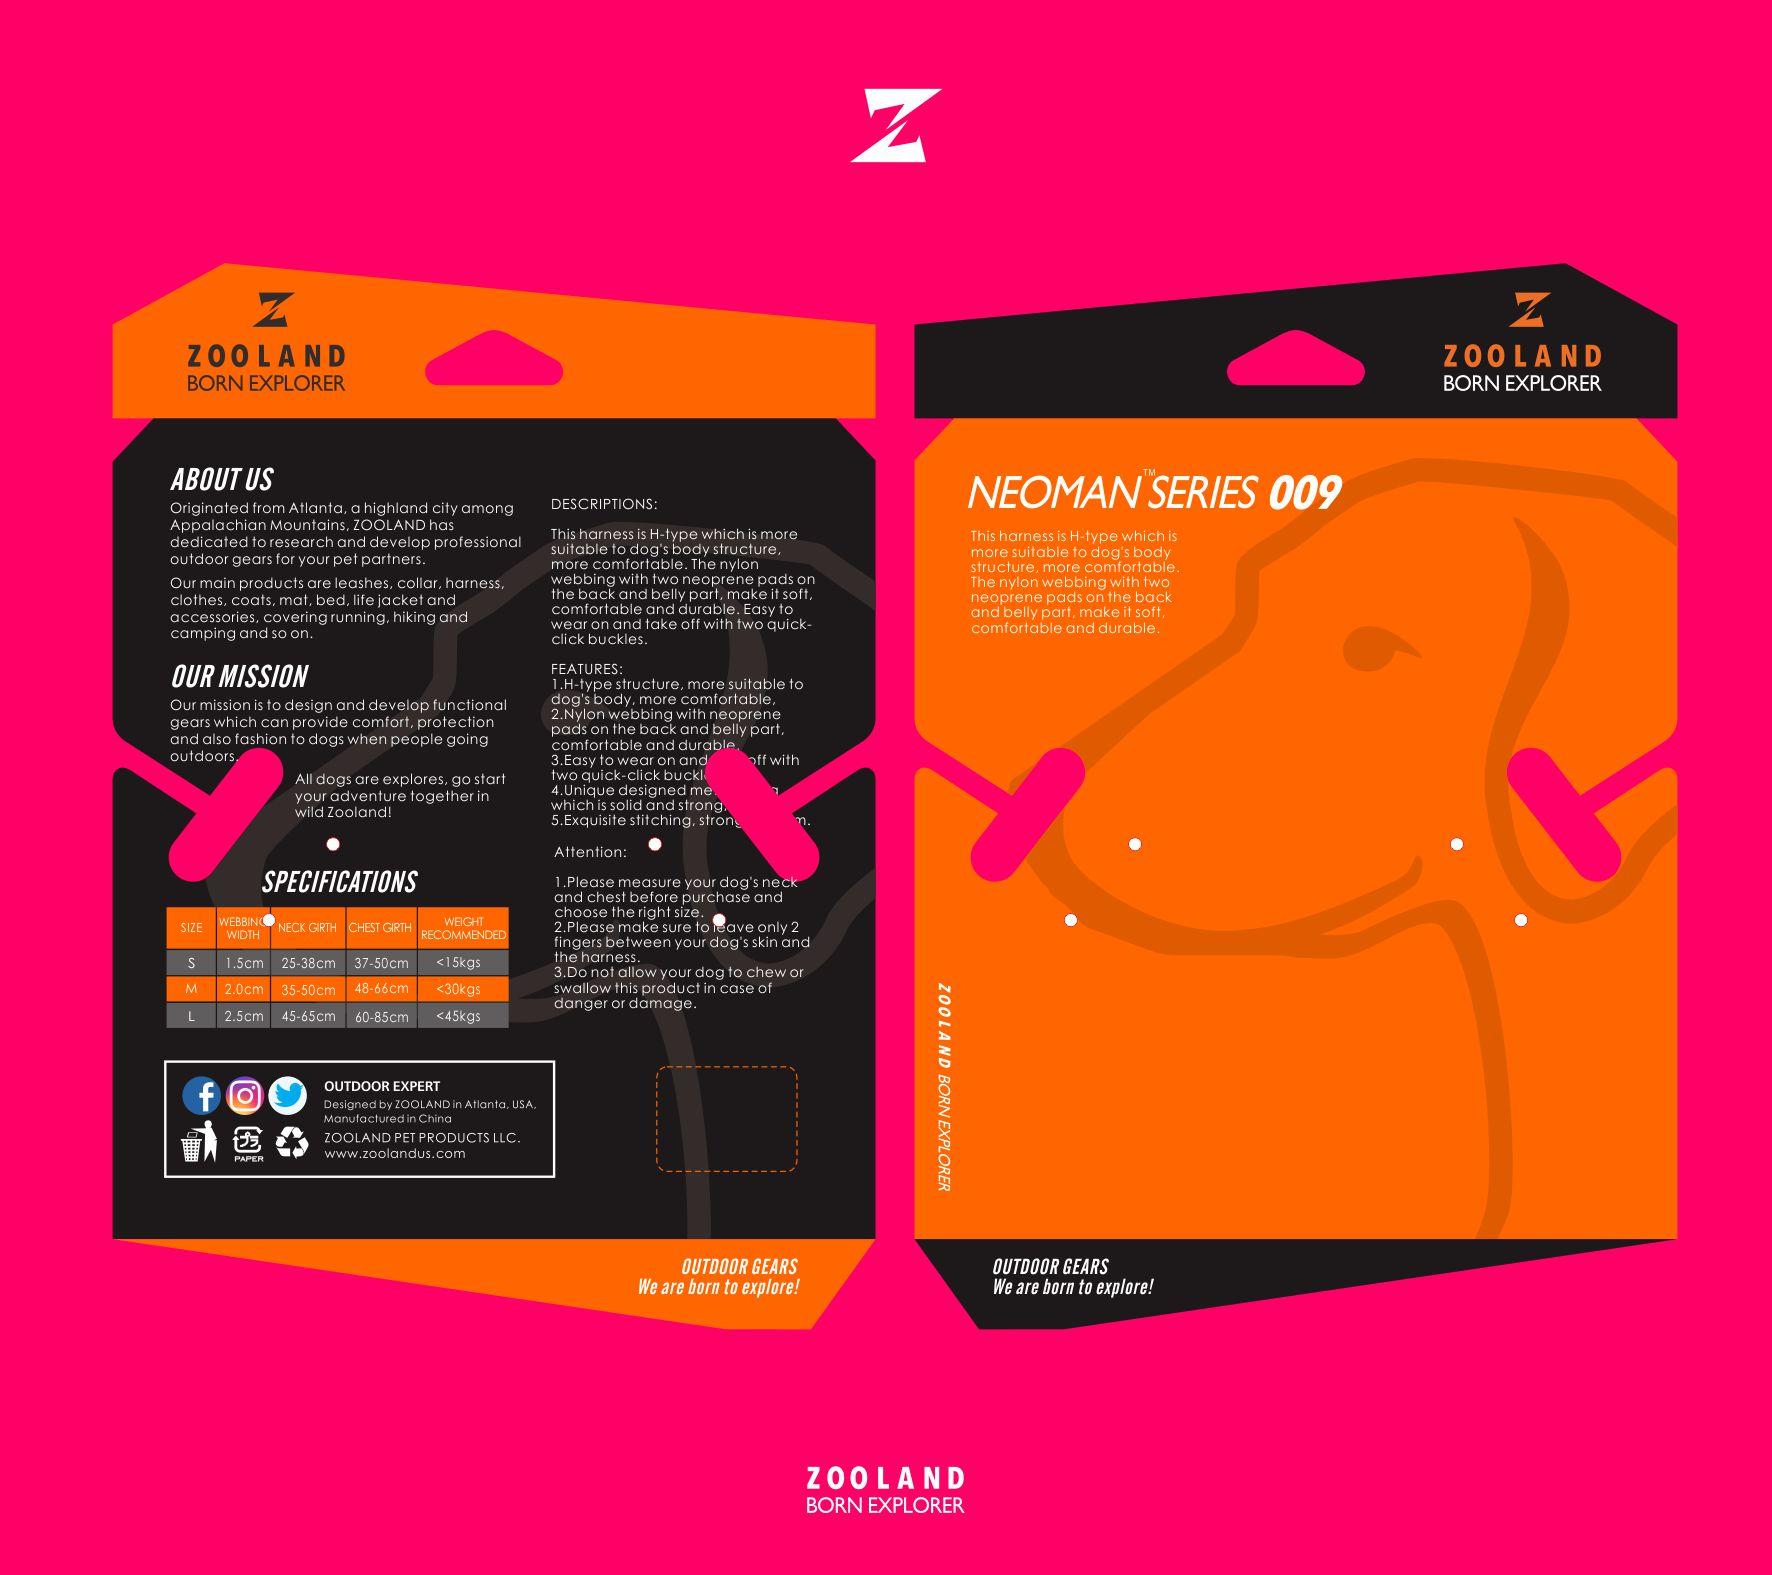 zooland背卡包装设计